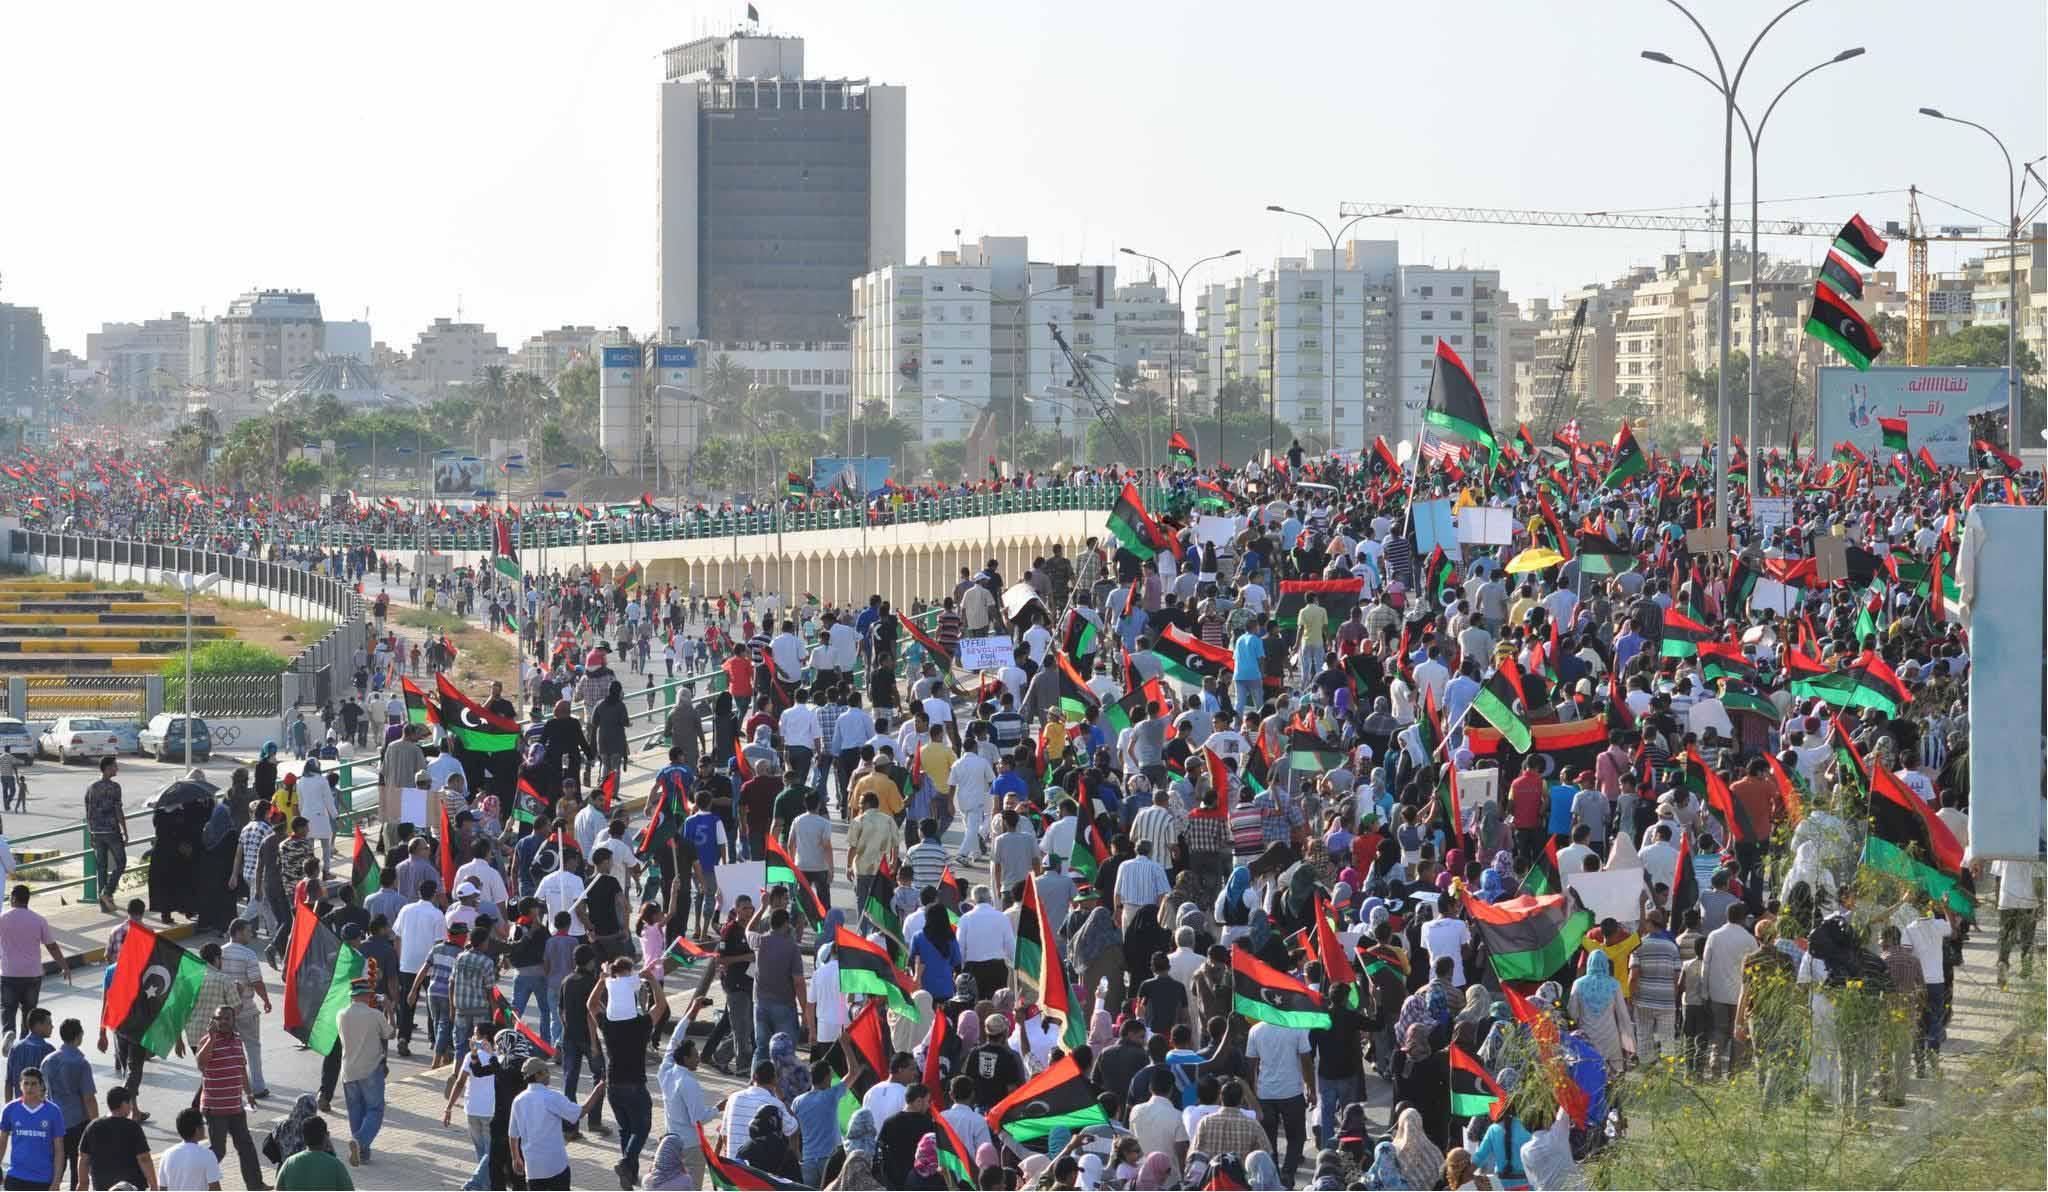 cf02b7094 بنغازي - Wikiwand